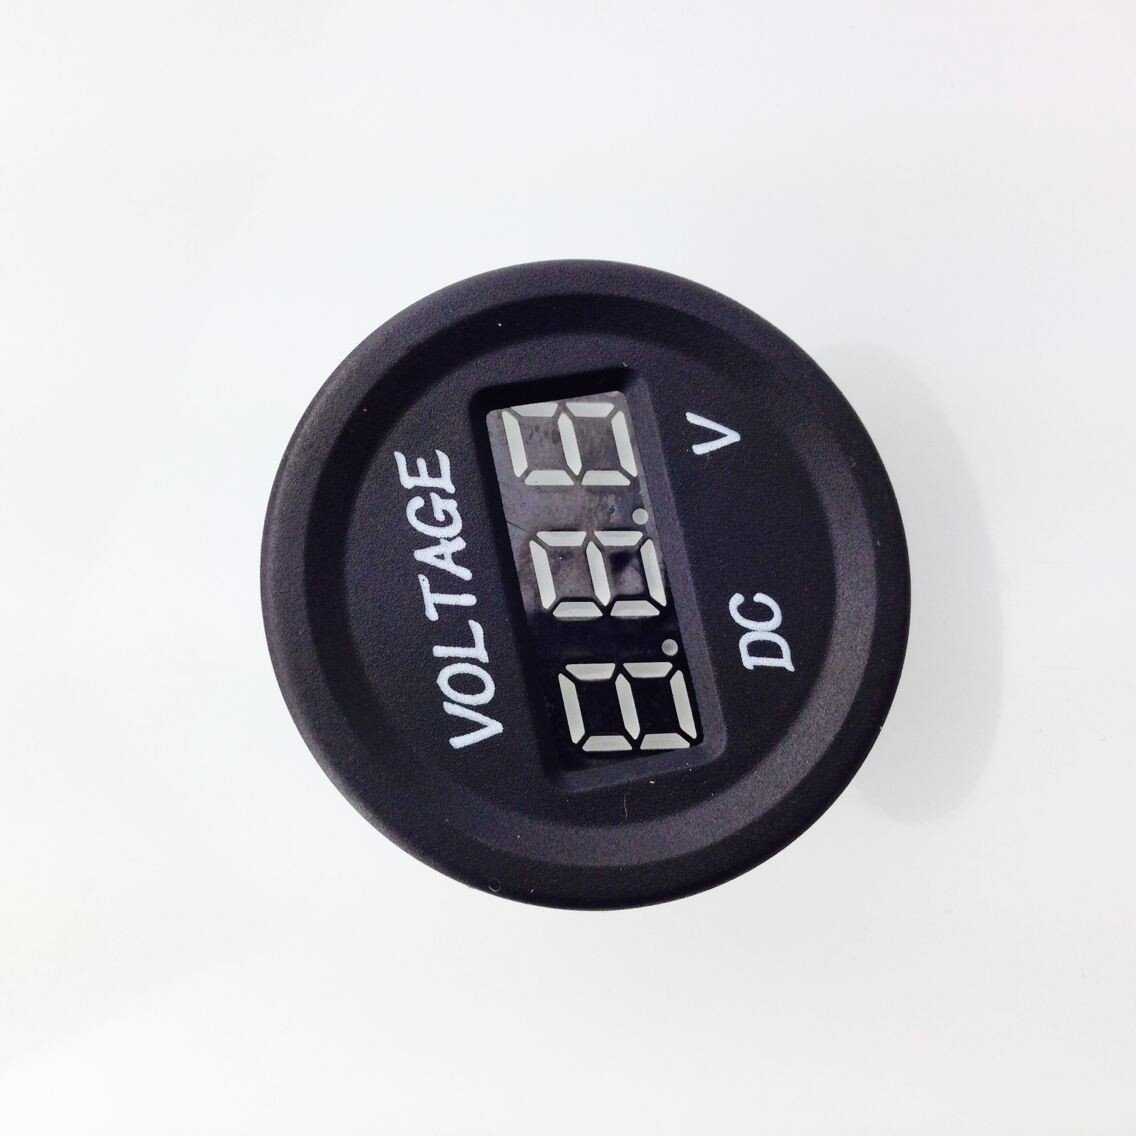 Jili Online 12V 24V Waterproof Car Motorcycle LED Digital Display Voltmeter With Cable